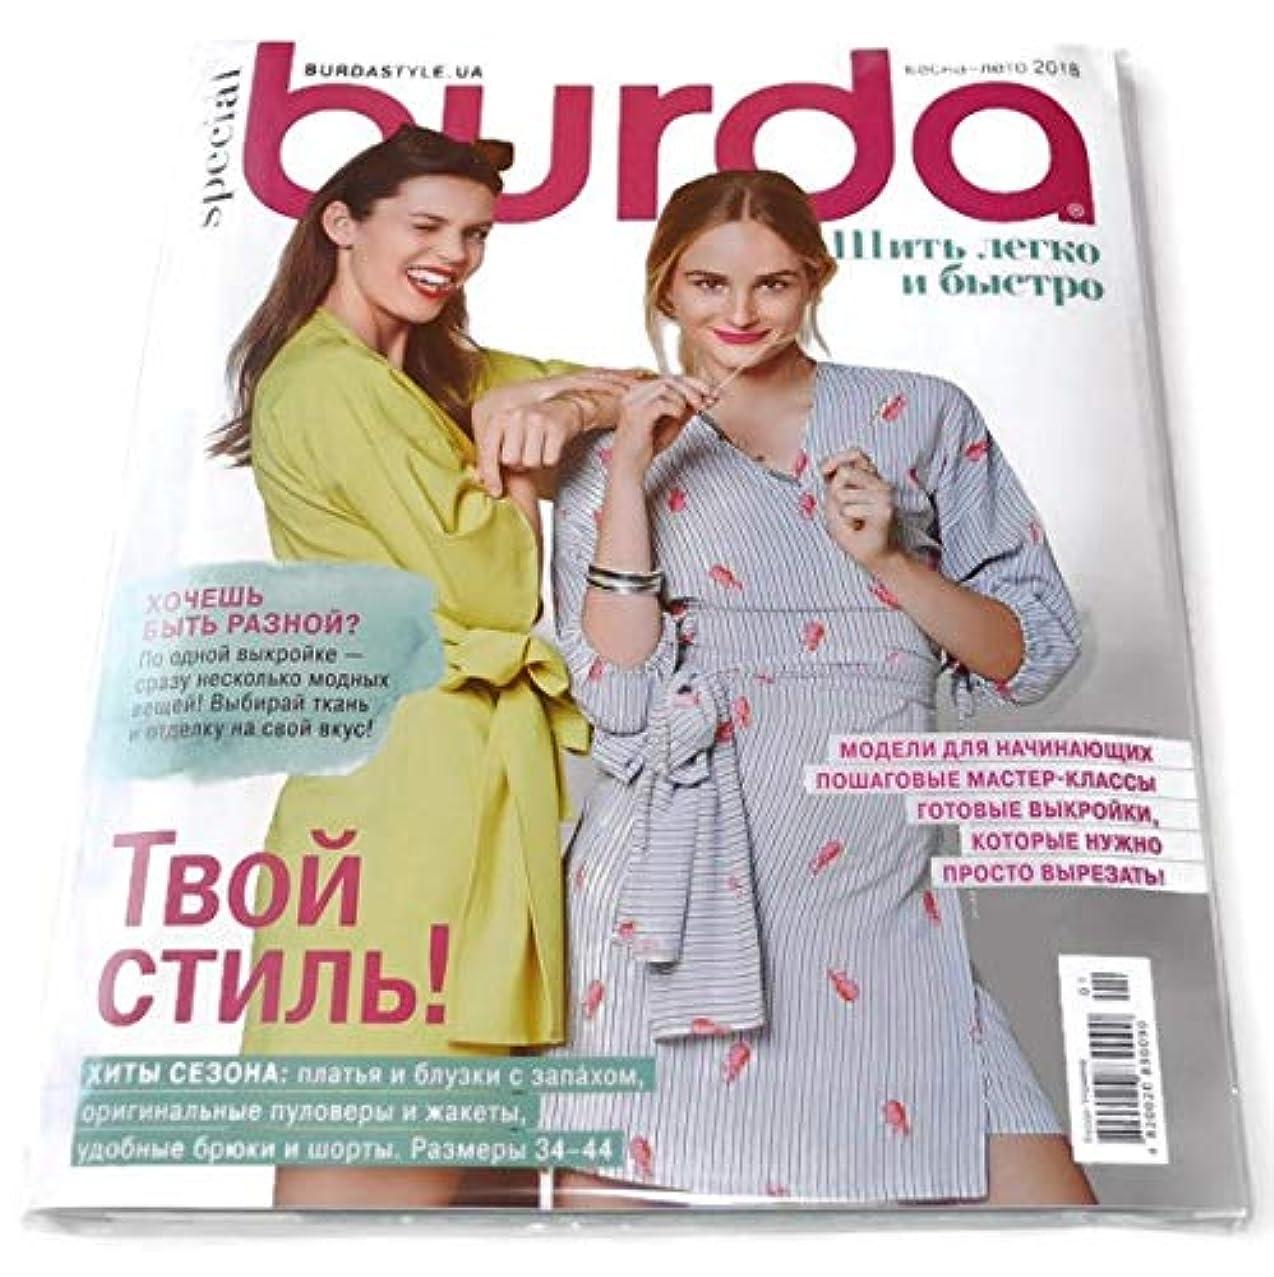 BURDA Style Magazine 2018 Spring Summer in Russian Language Fashion Sewing Patterns Burdastyle Бурда